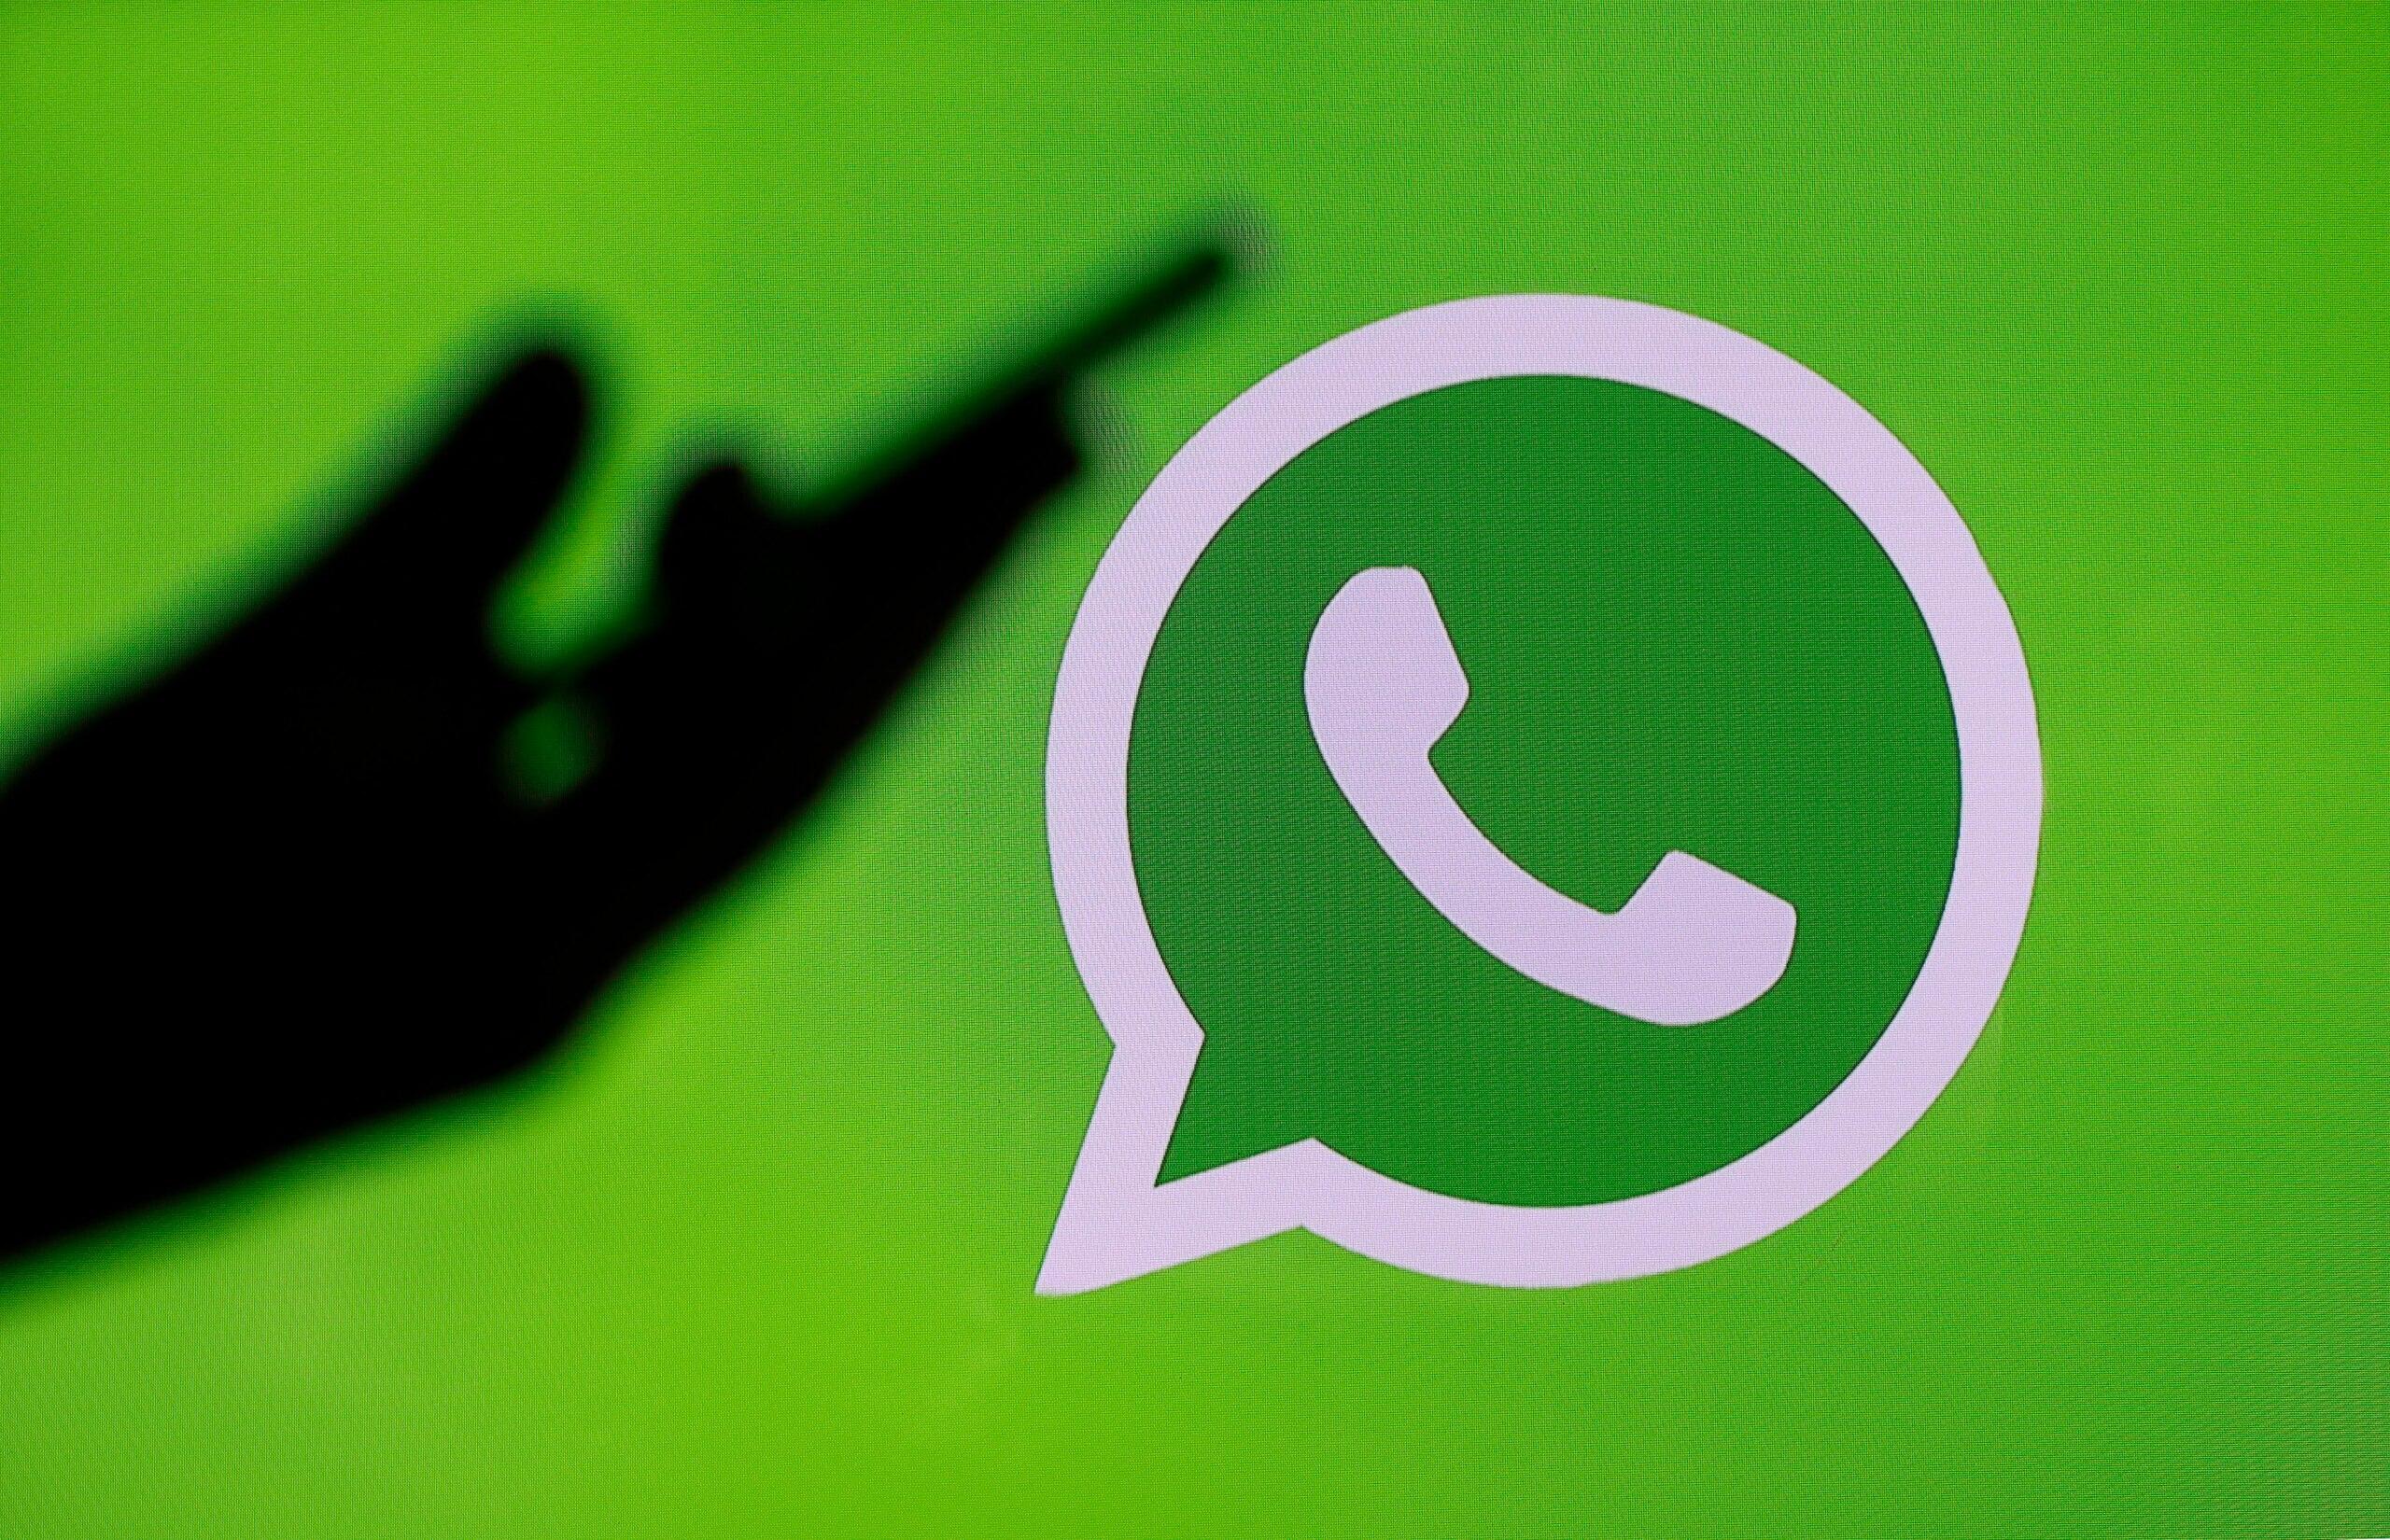 WhatsApp-ndert-die-AGBs-nun-doch-nicht-im-Februar-